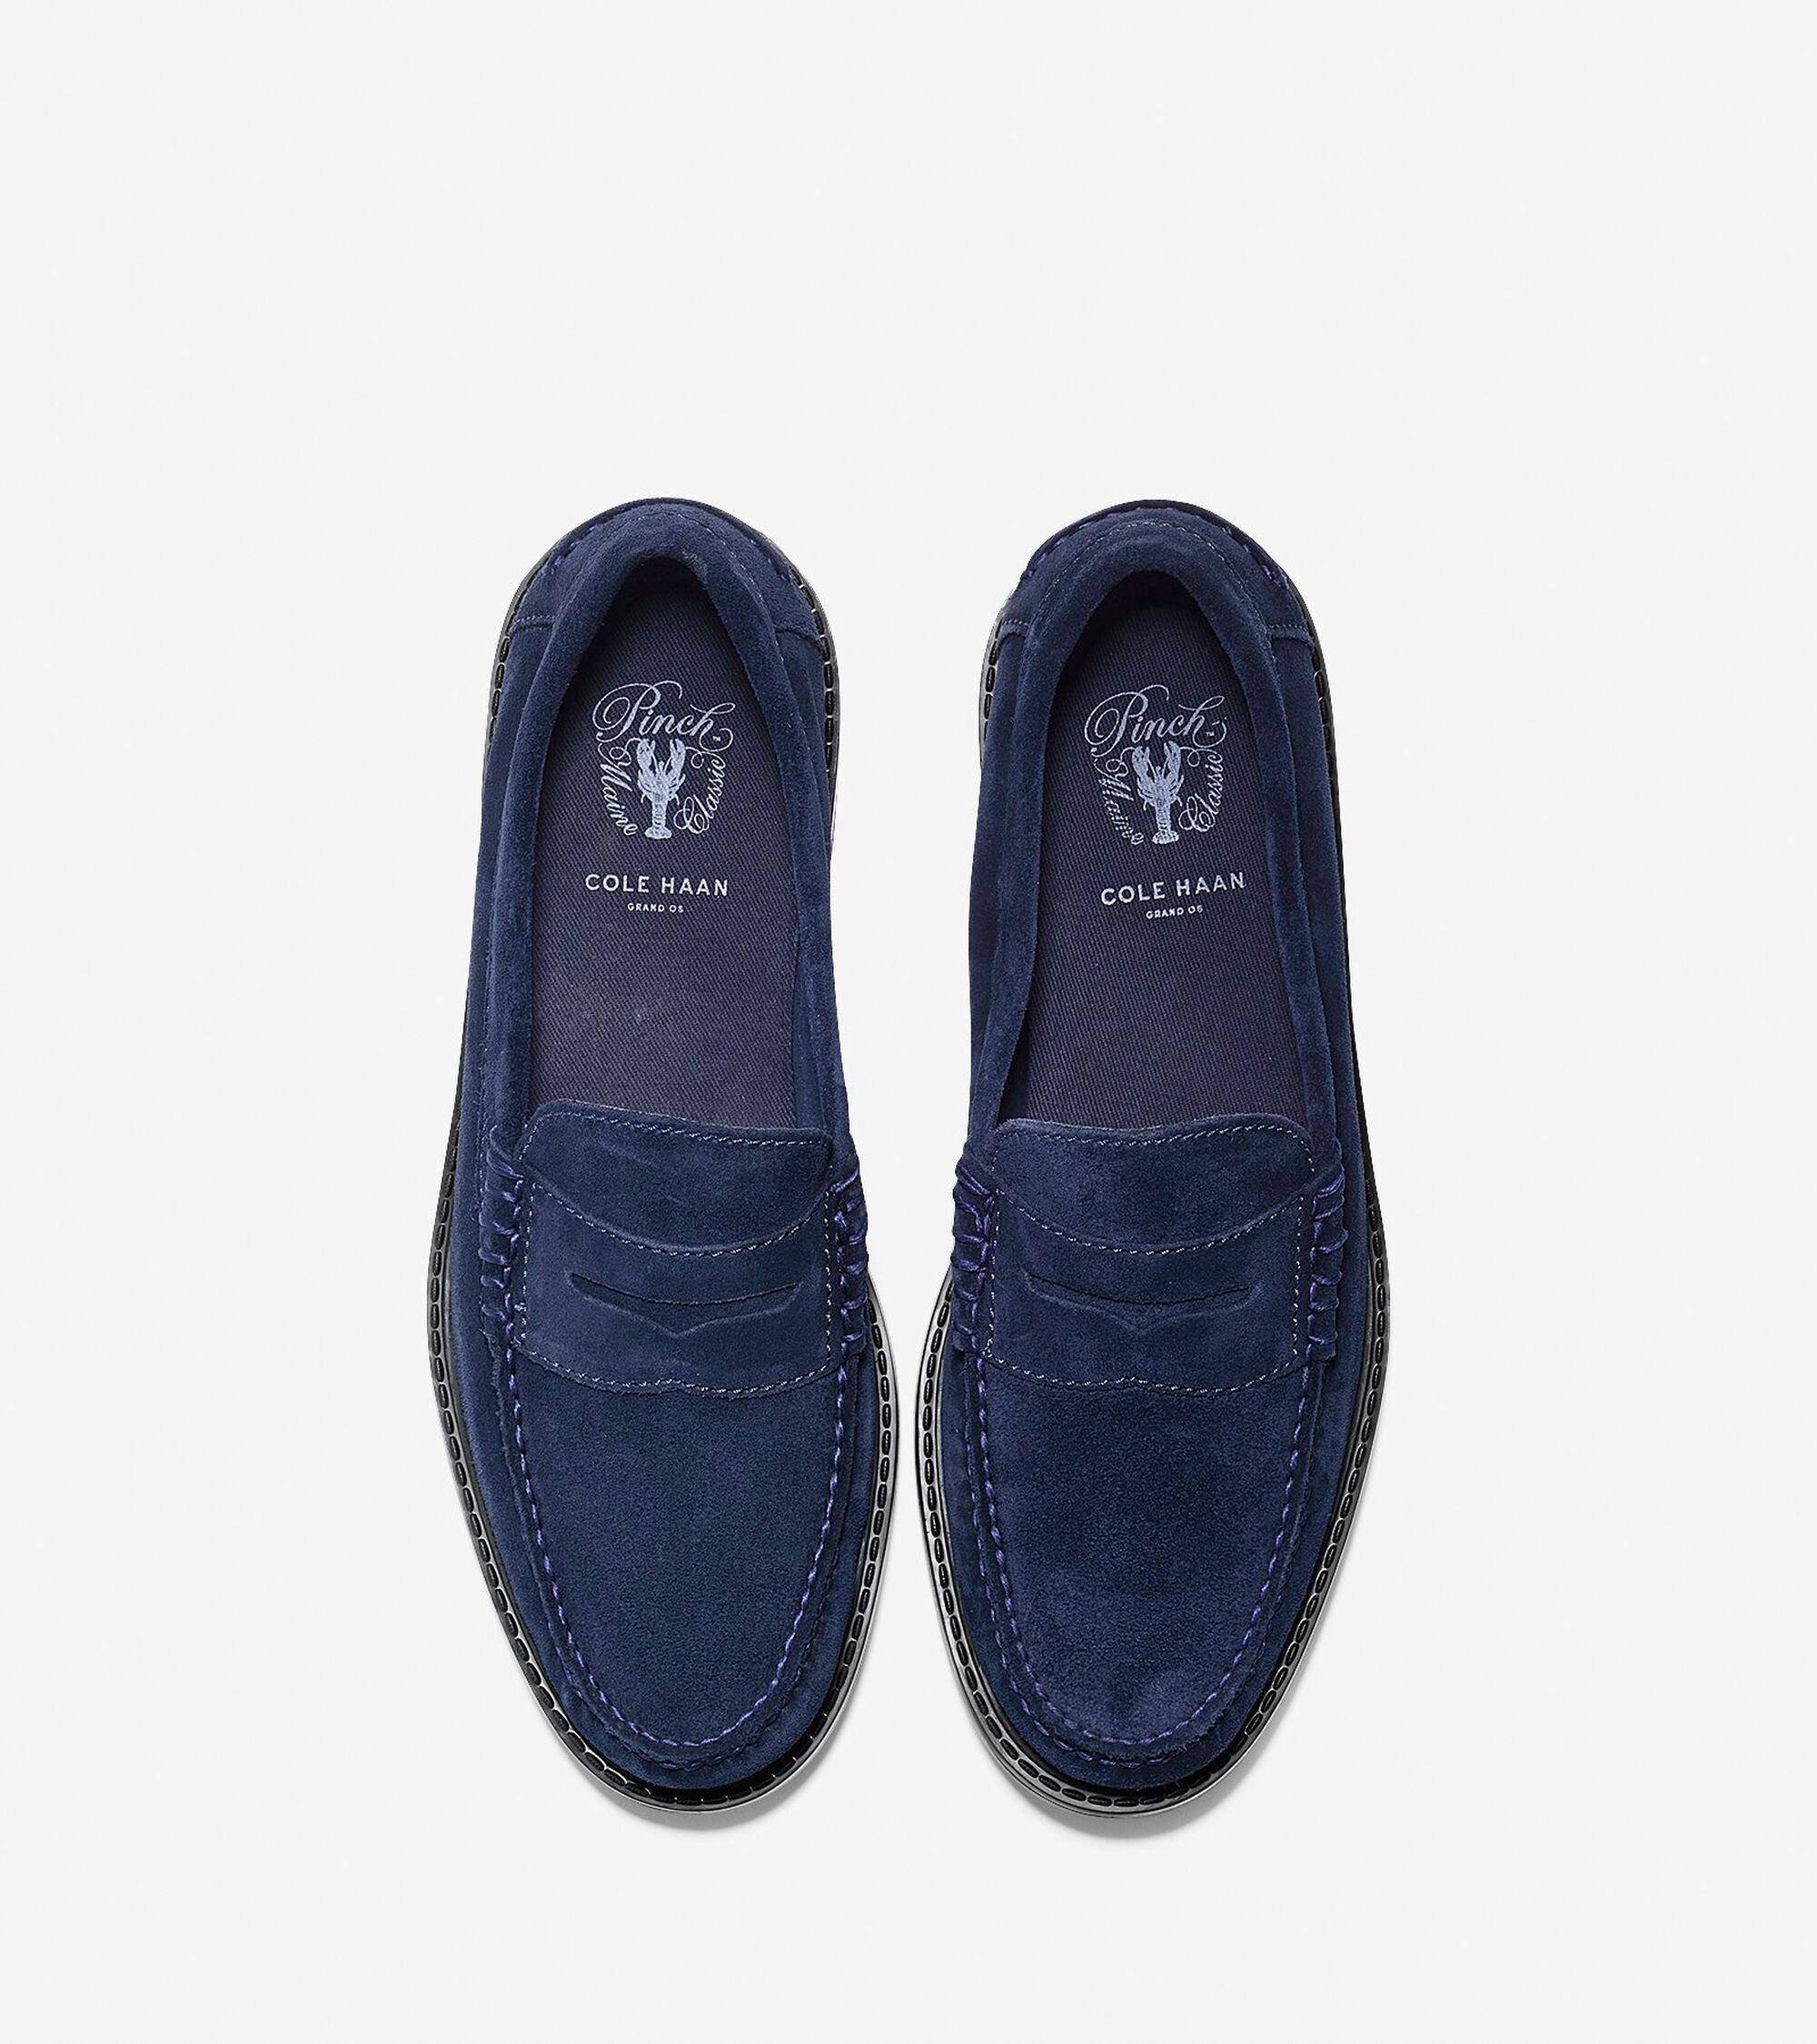 Large Womens Shoes Sydney